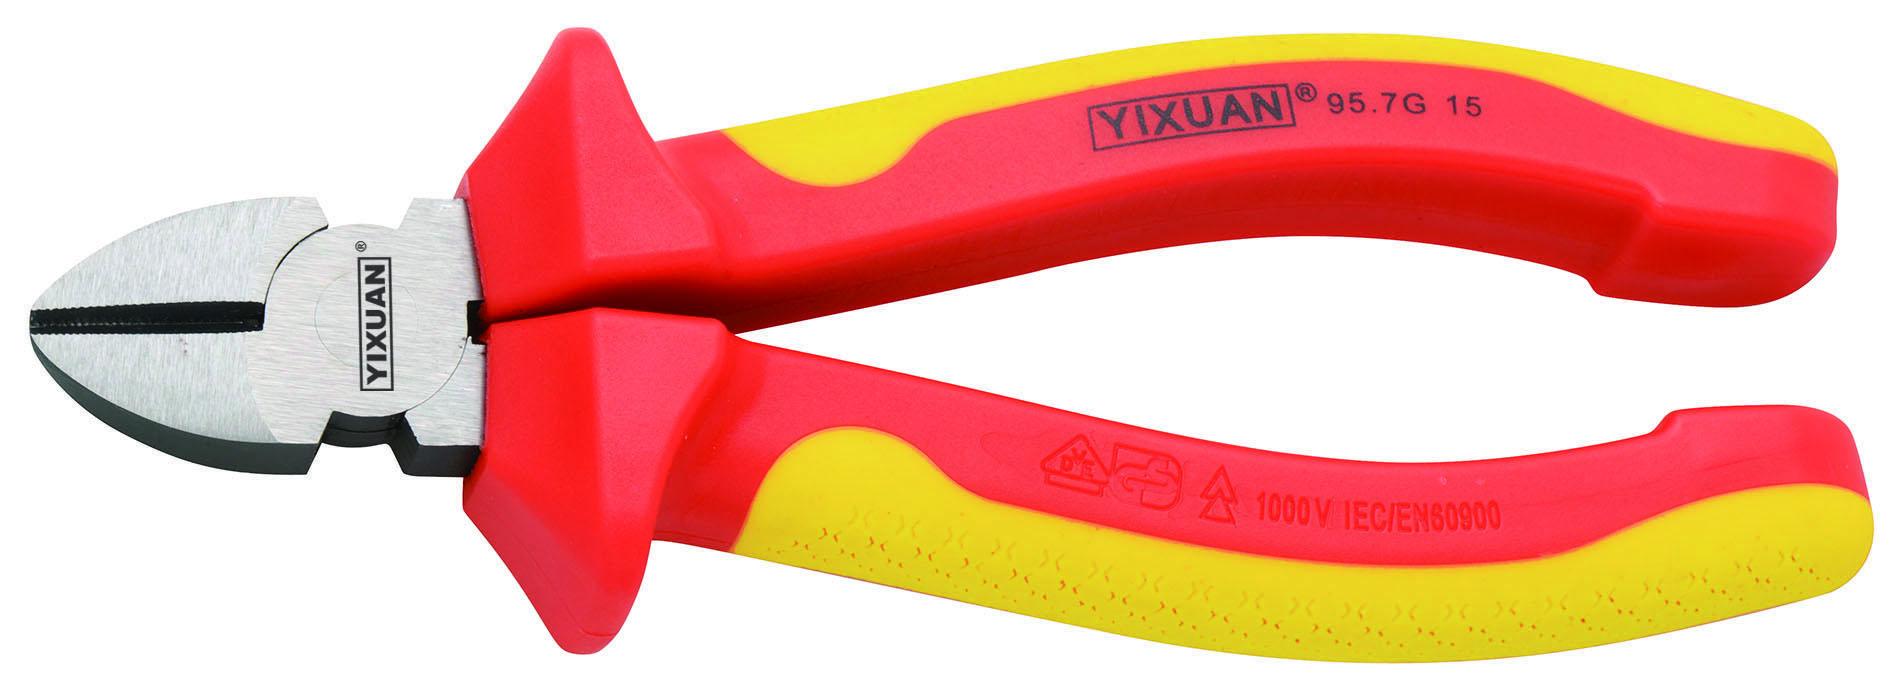 VDE Diagonal Cutter plier